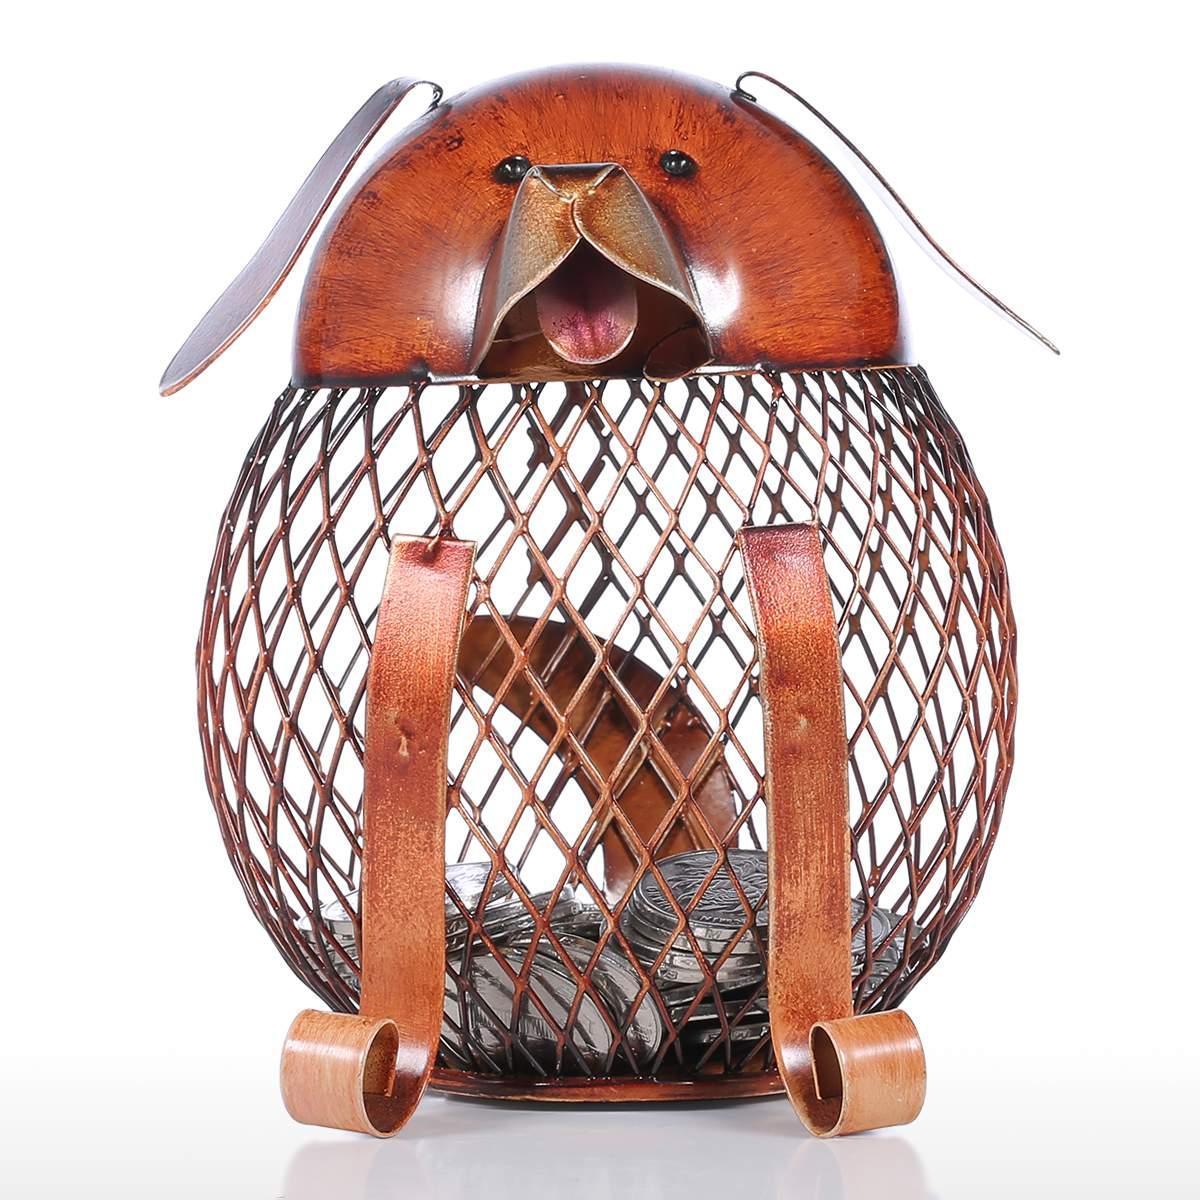 Iron  Piggy/Chick/Dog  Bank Coin  Storage Case Home Decoration Animal Figure Iron Art Fortune Dog Piggy Bank